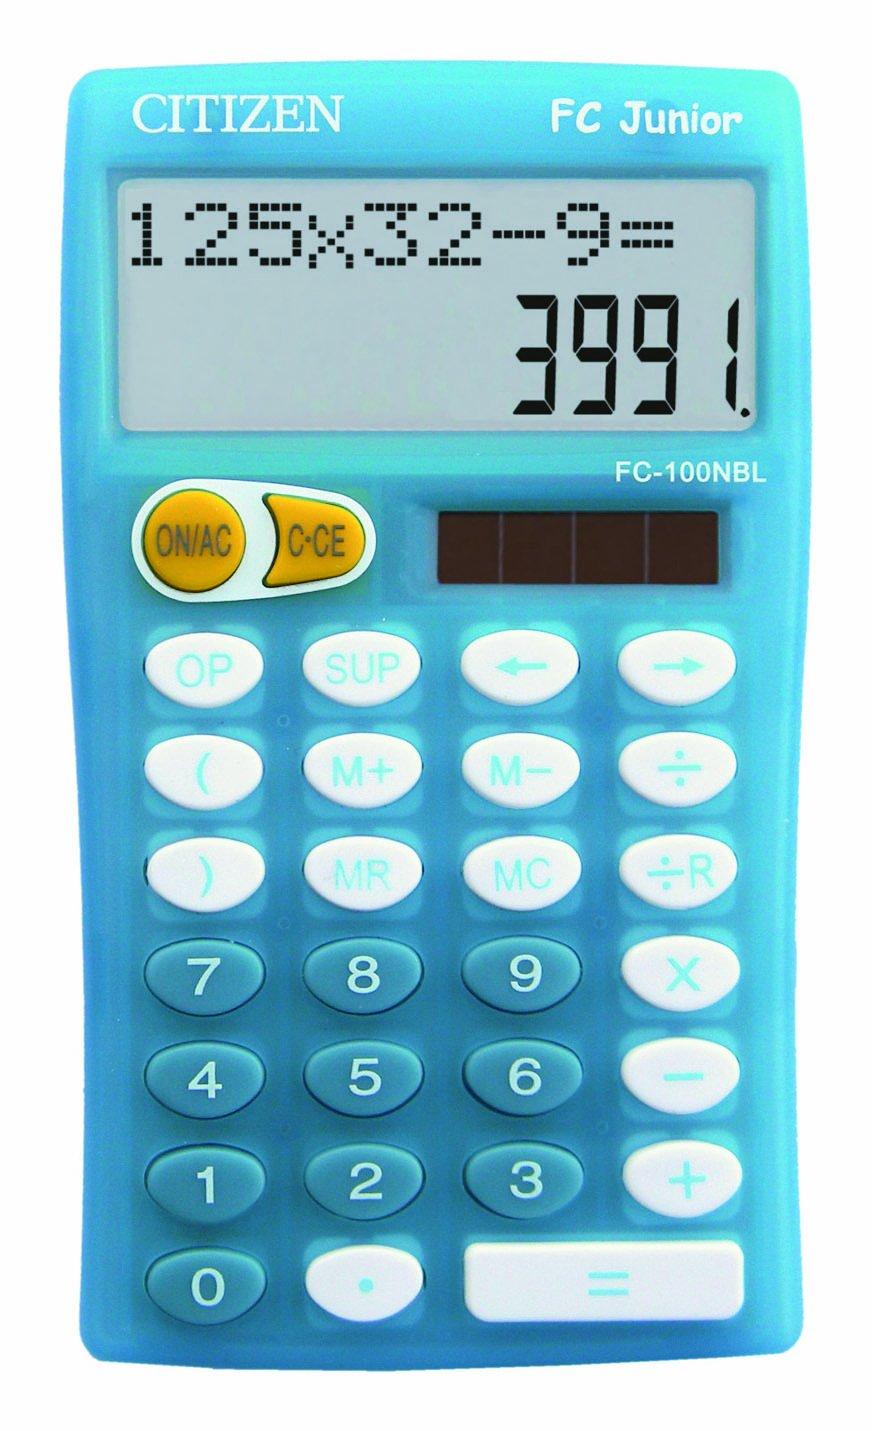 CITIZEN Calculatrice scolaire primaire 10 grands chiffres bleue